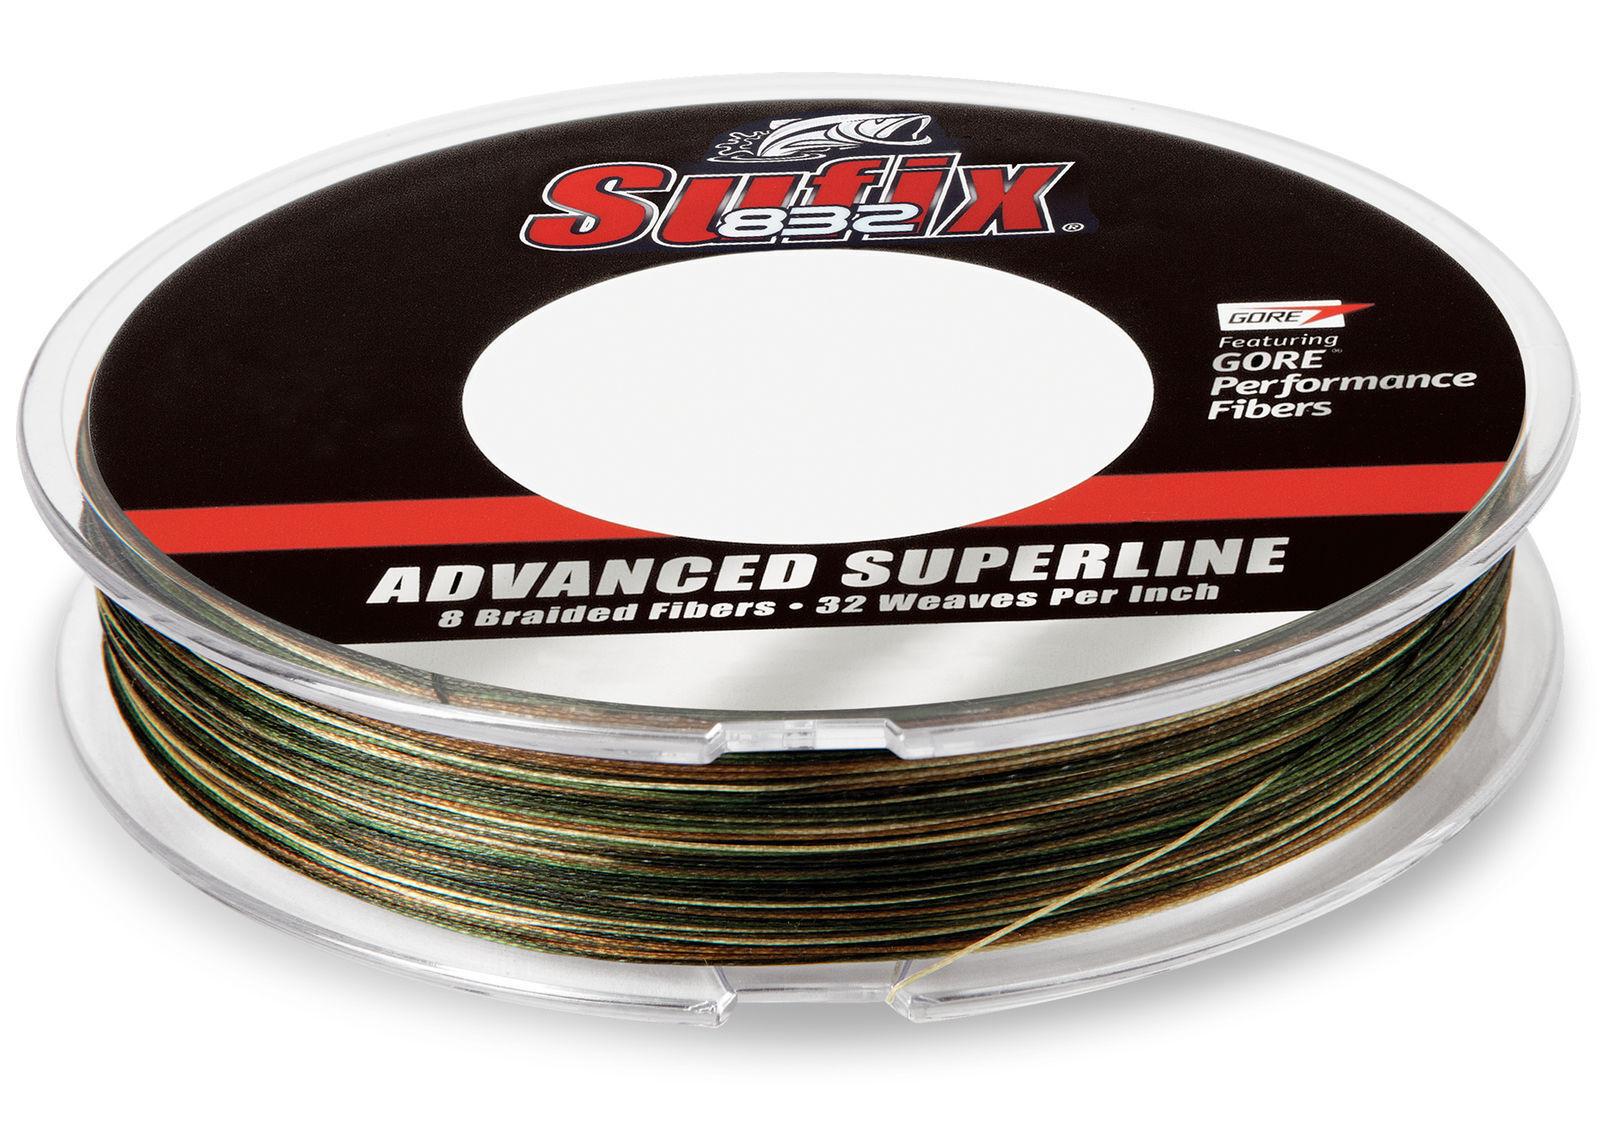 Sufix 660-220CA 832 Advanced Superline  Fishing Braid 20 lb 600 yds Camo  guaranteed